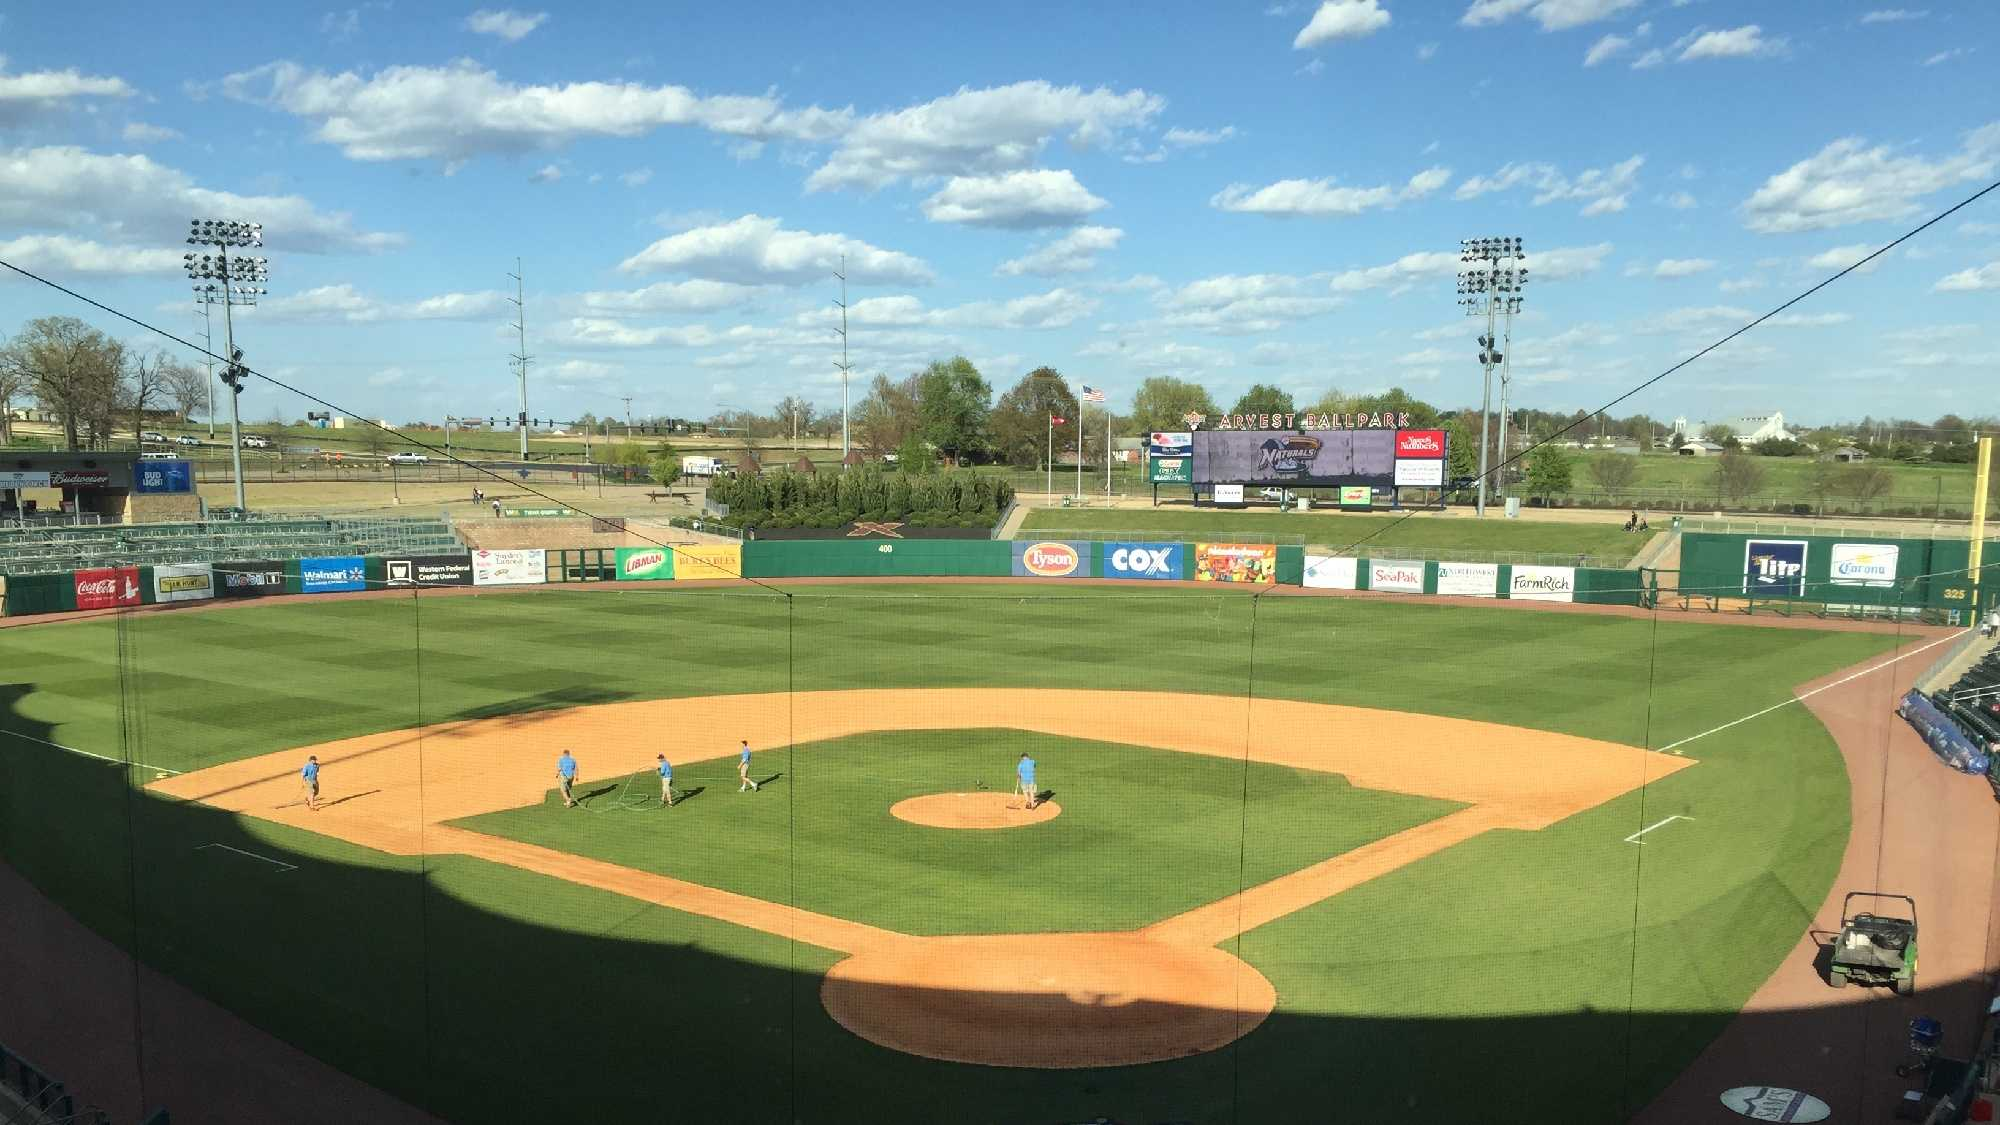 Arvest Ballpark introduces new scoreboard in center field